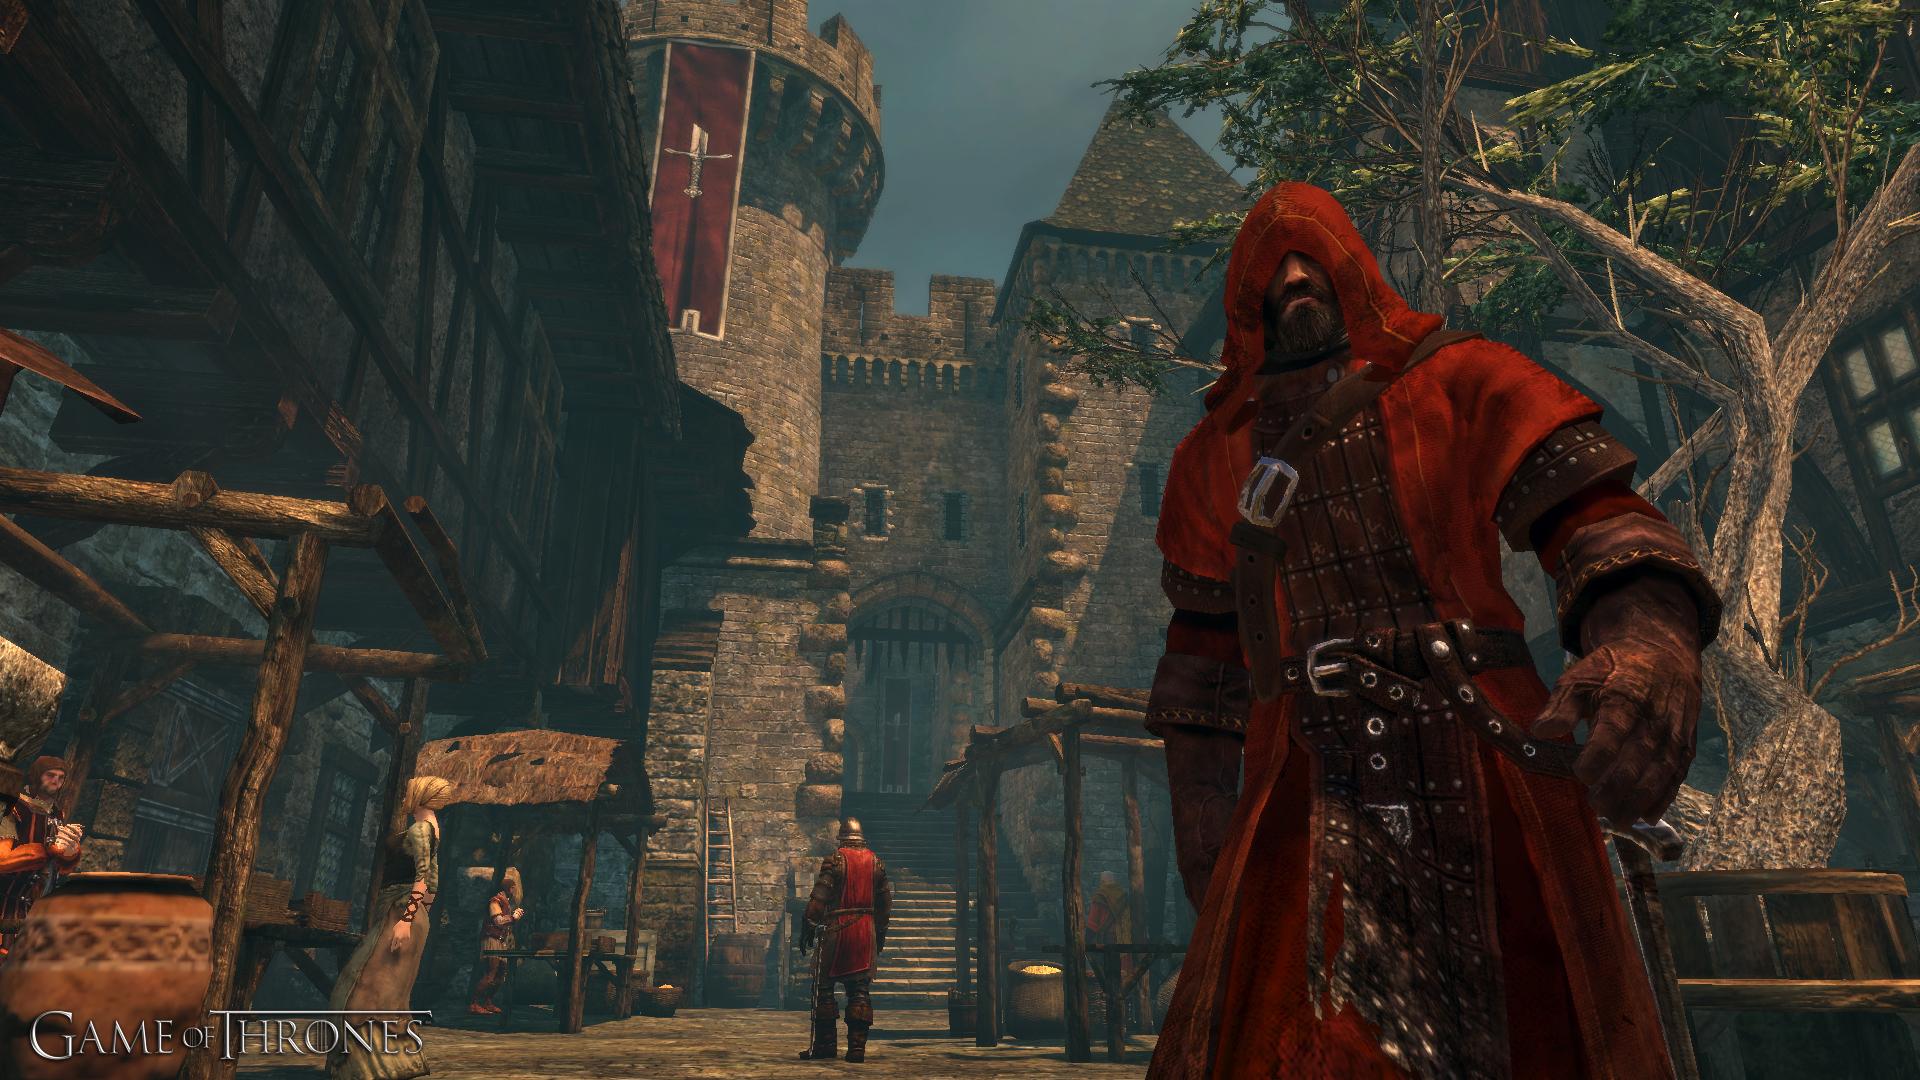 game_of_thrones-04.jpg